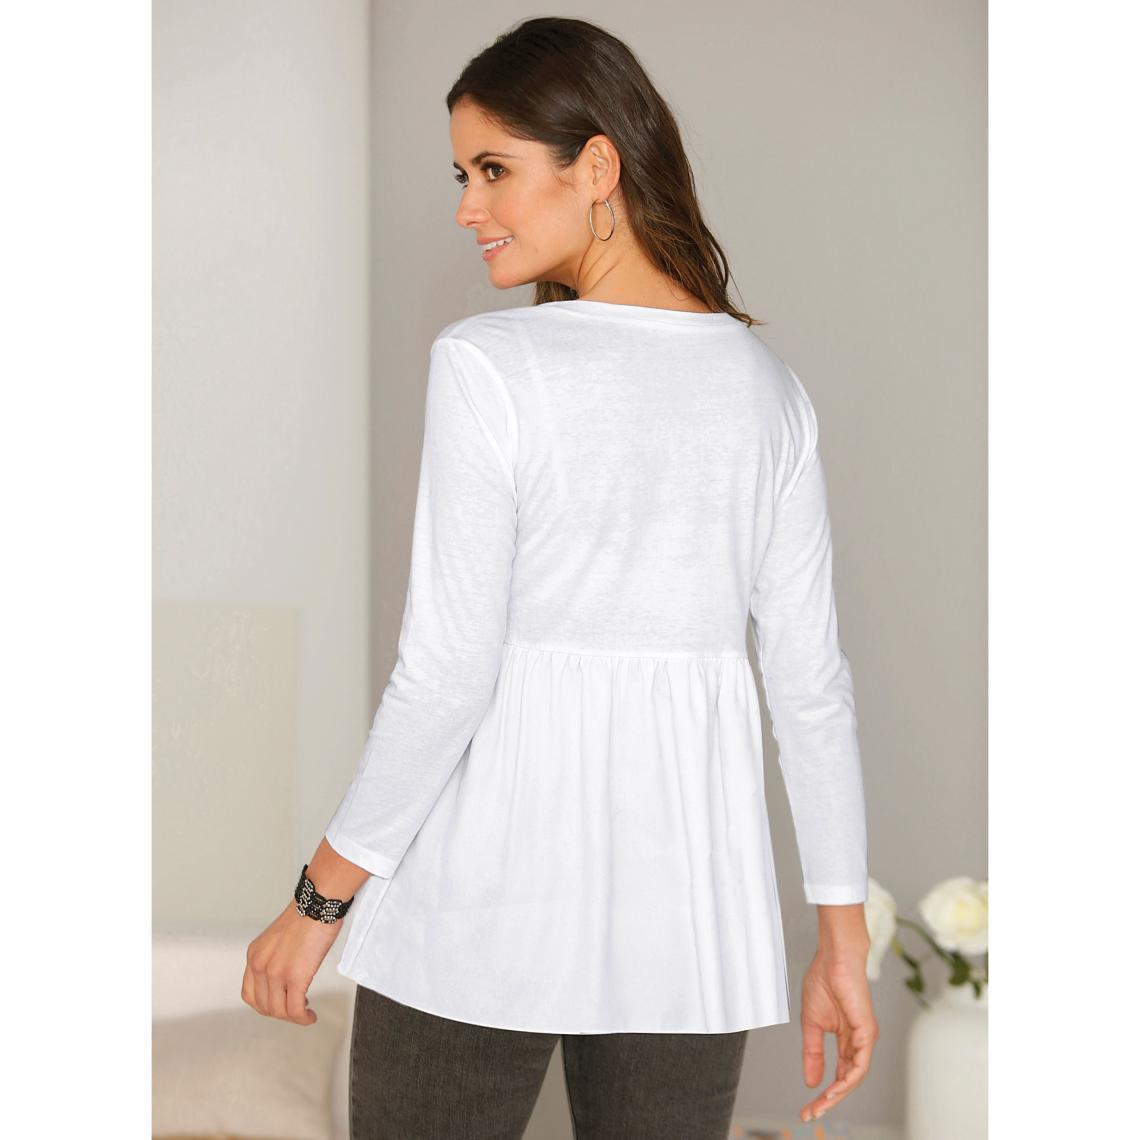 62be811cfaa Tee-shirt manches longues bas arrondi boutons perles et fronces ...